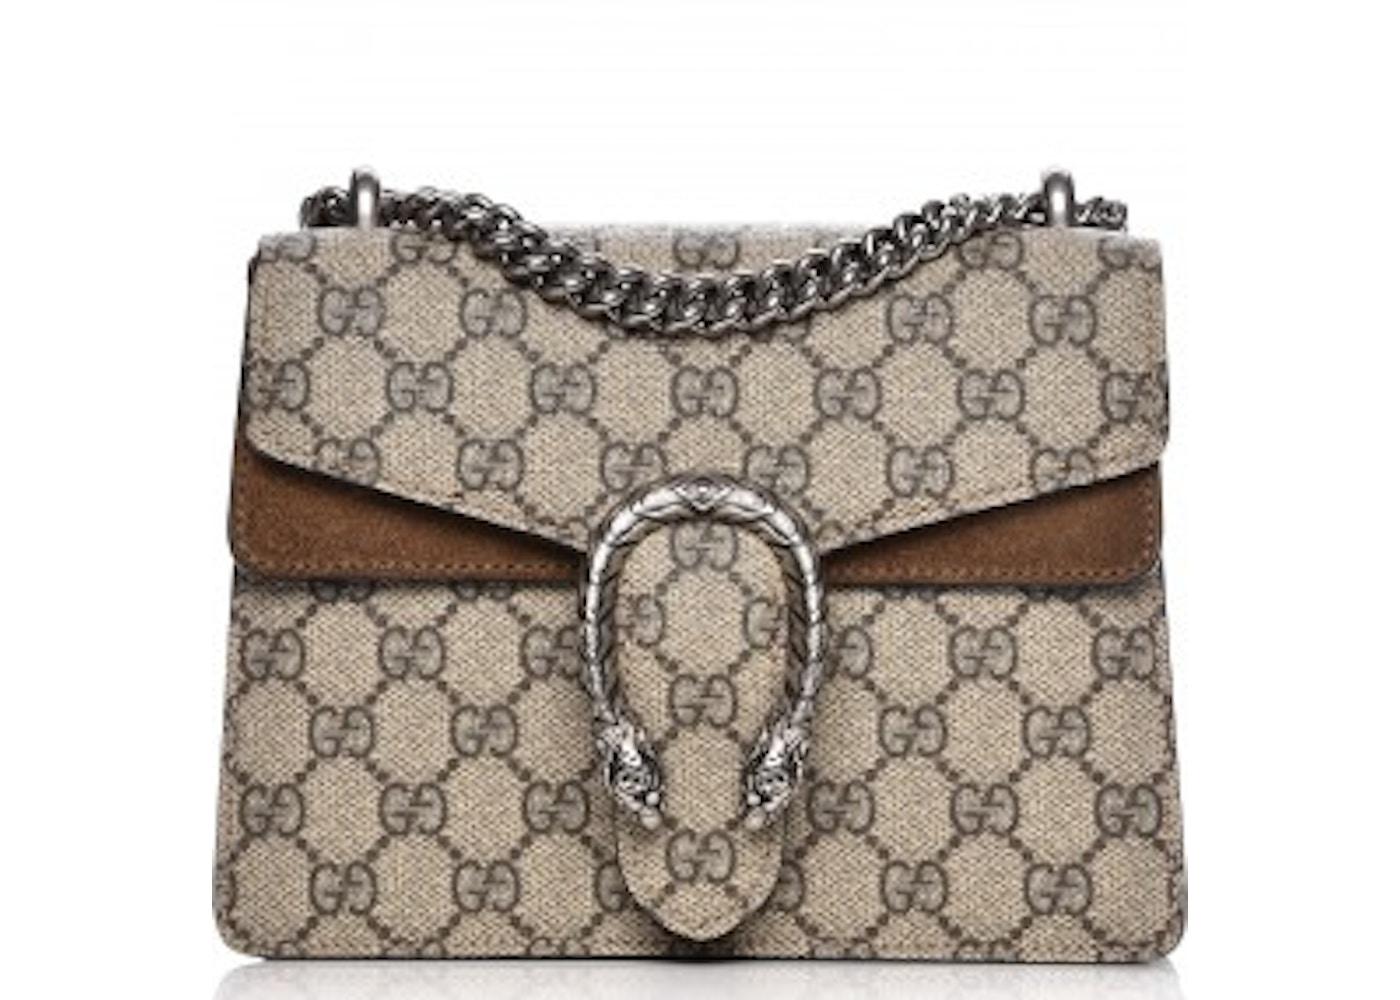 c36cf021d28 Gucci Dionysus Shoulder Bag GG supreme Monogram Horseshoe ...